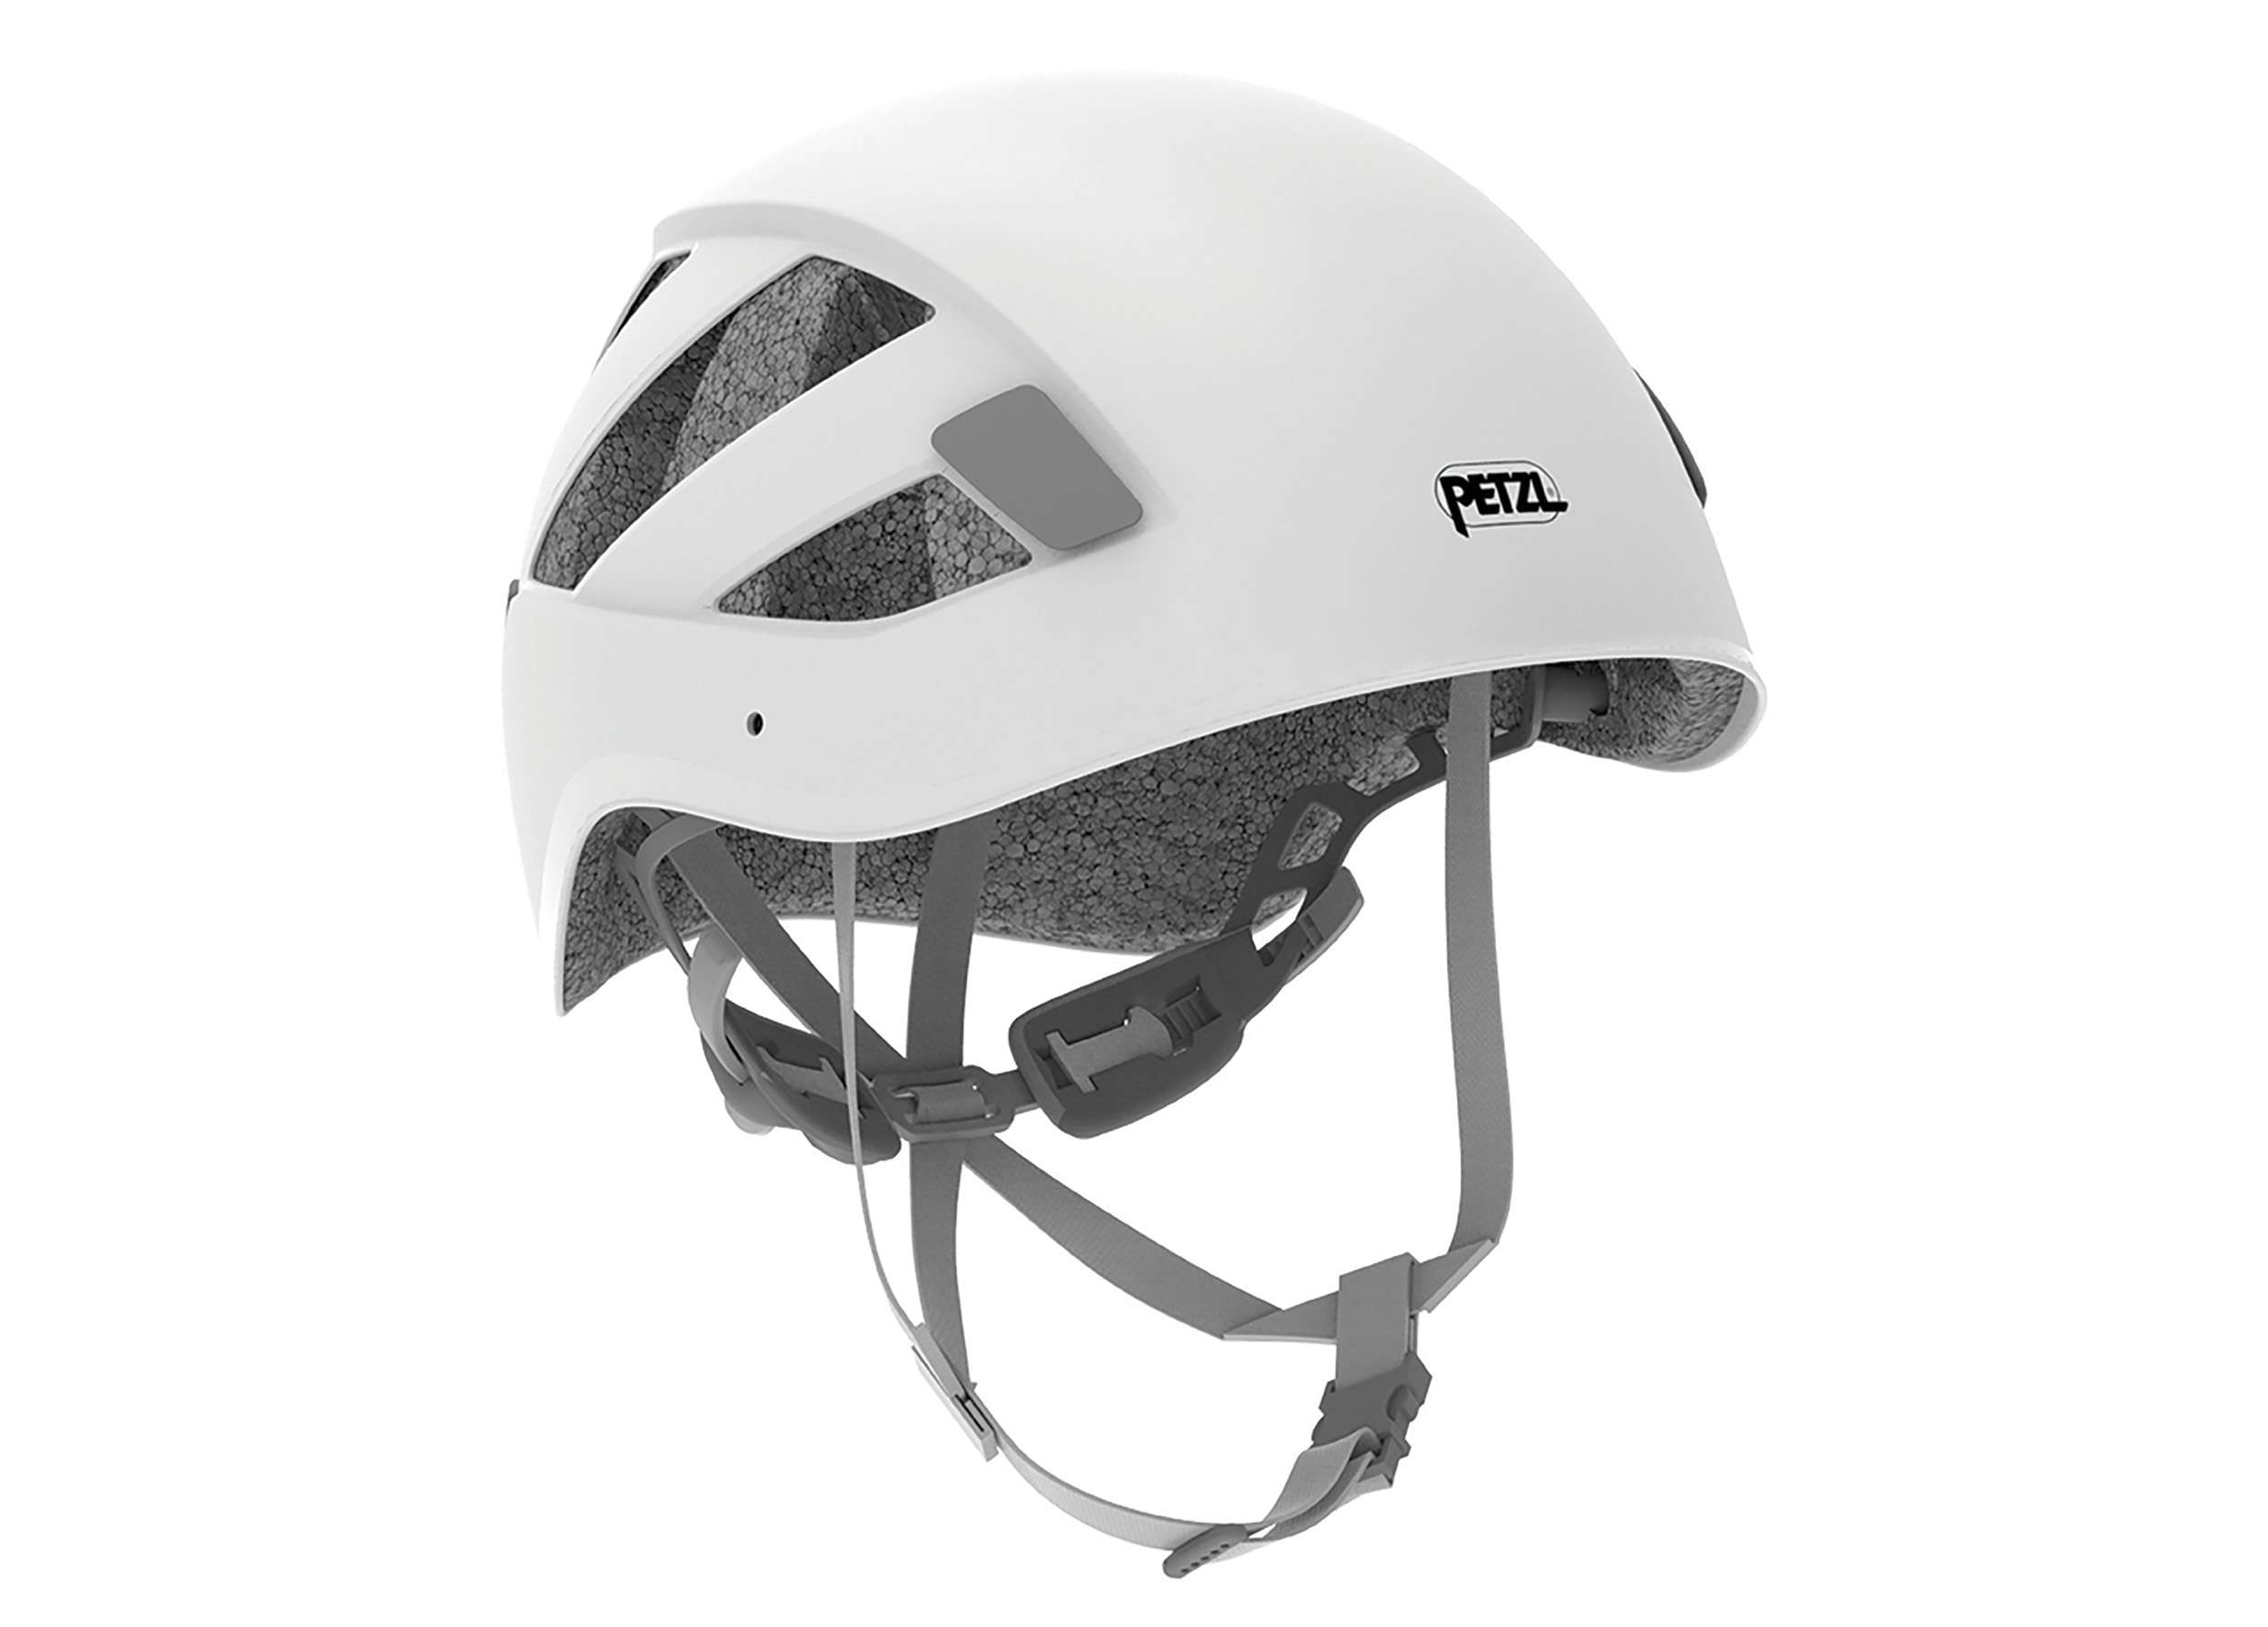 Petzl Corax Klettergurt Größe 1 : Petzl boreo kletterhelme helme sportklettern kletterladen.nrw